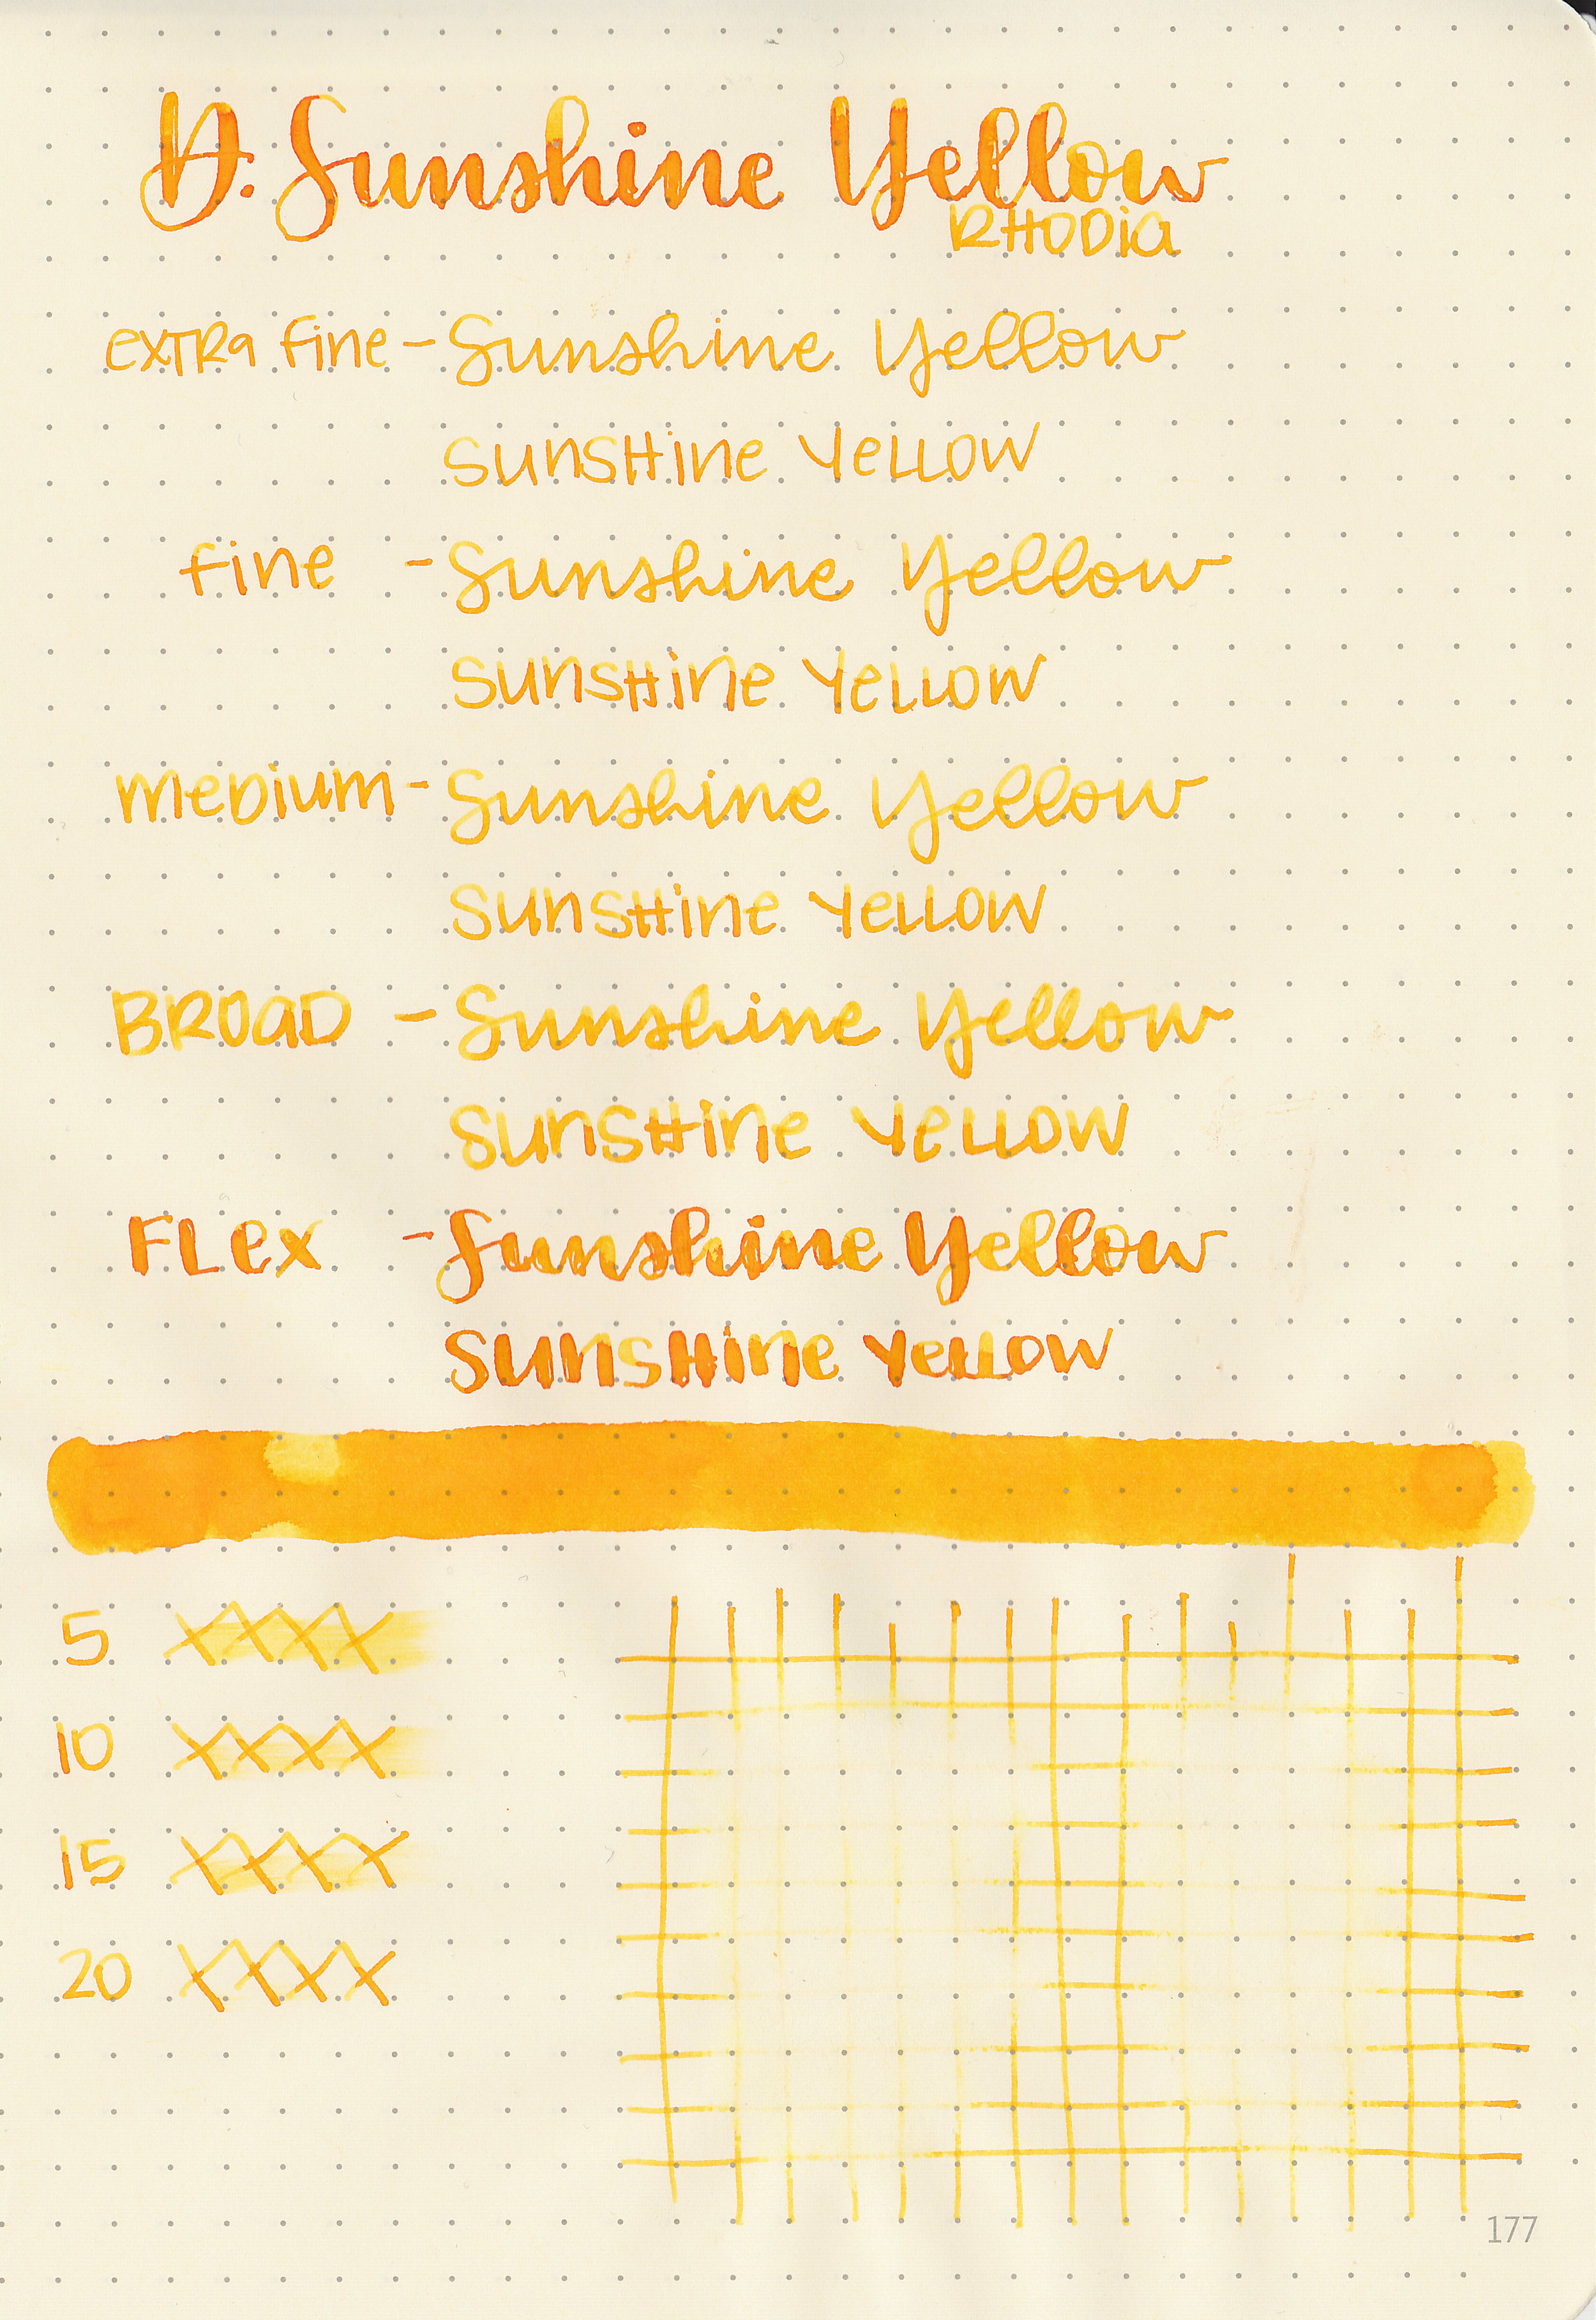 d-sunshine-yellow-7.jpg